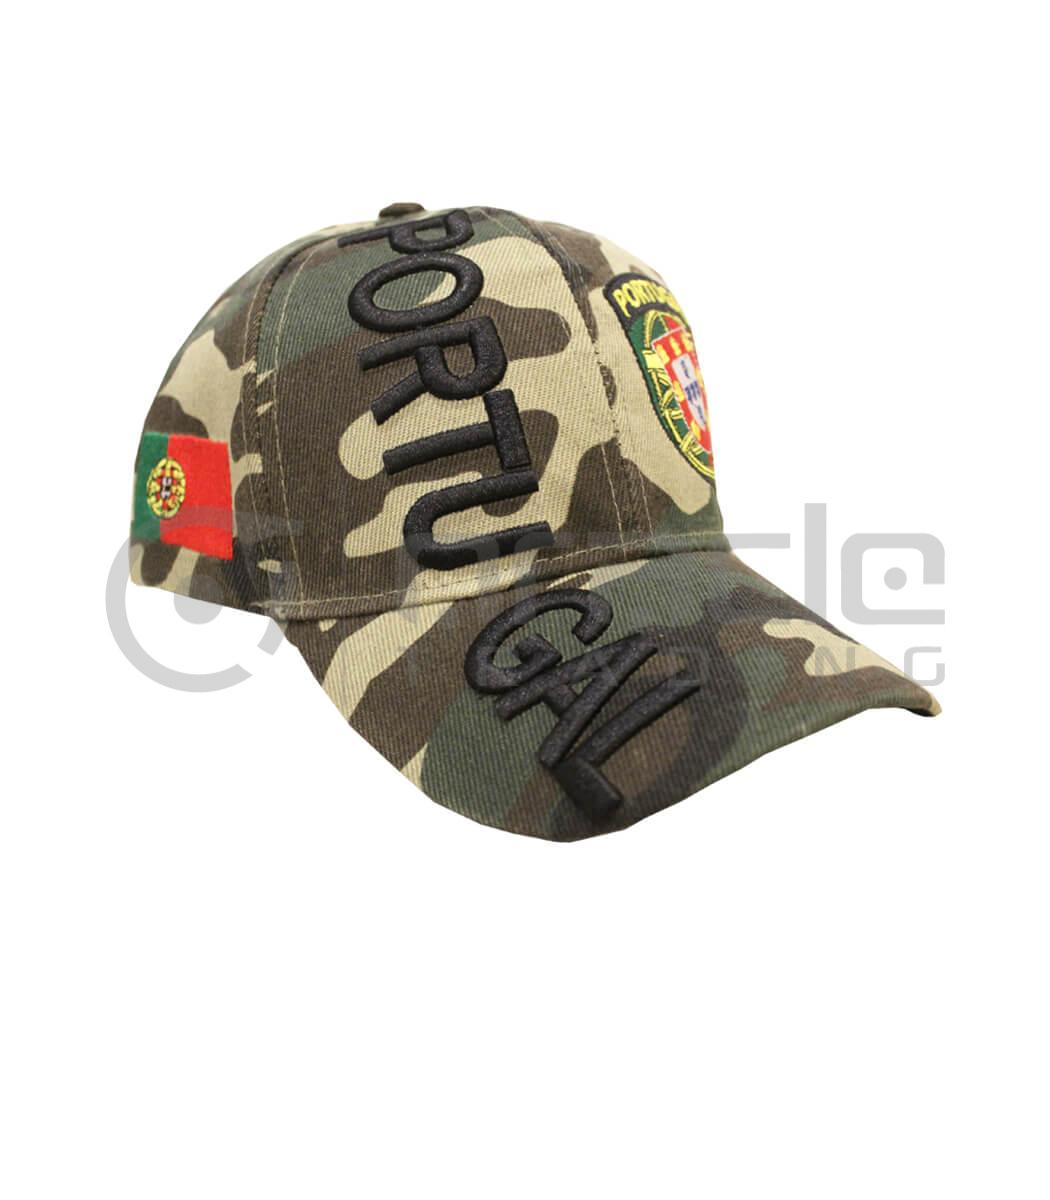 3D Portugal Hat - Camo